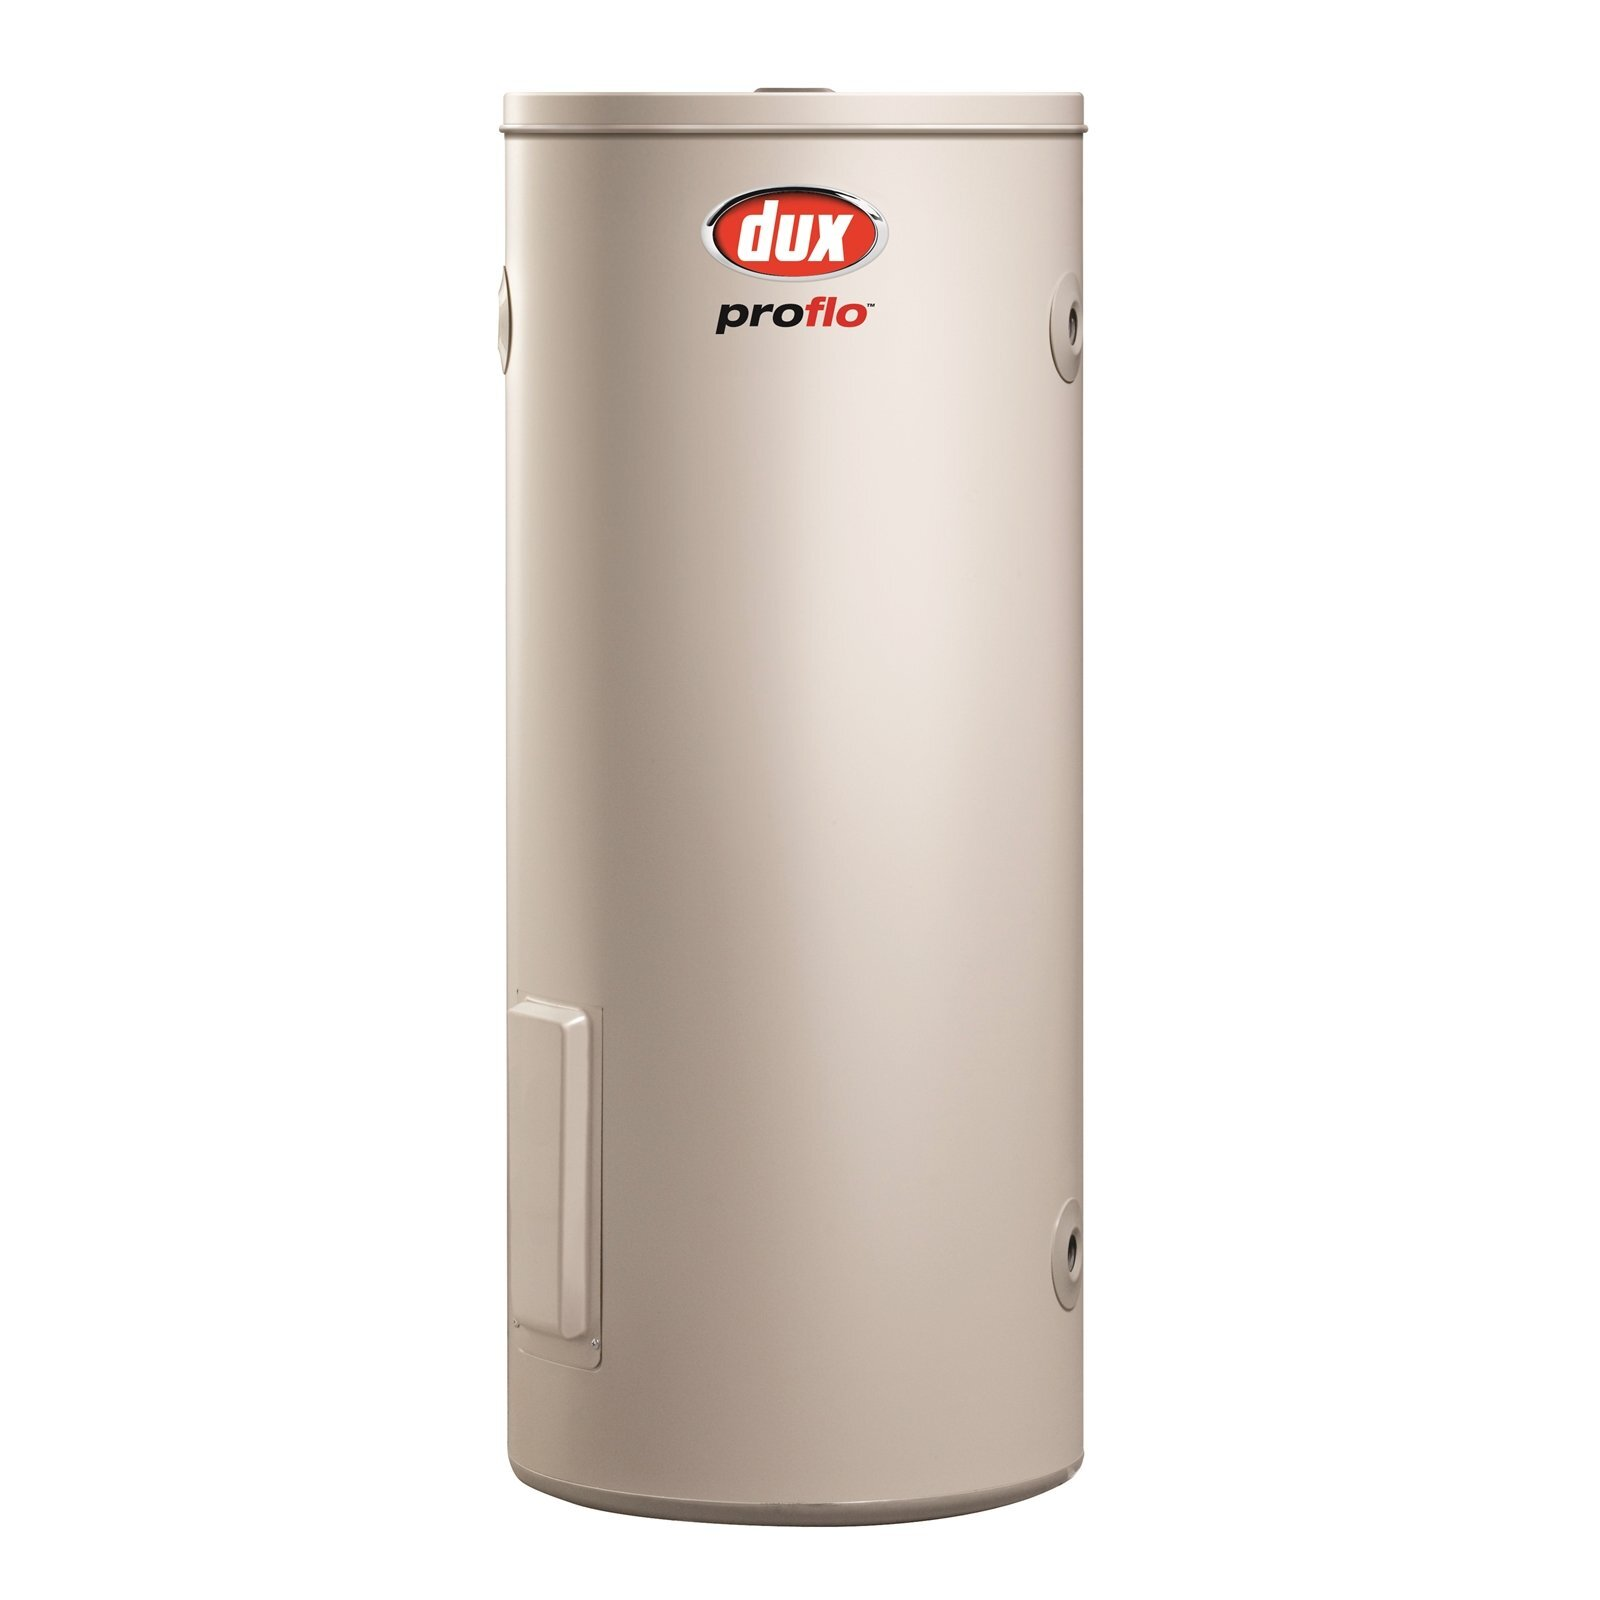 Dux 160L 3.6kW Proflo Electric Storage Water Heater